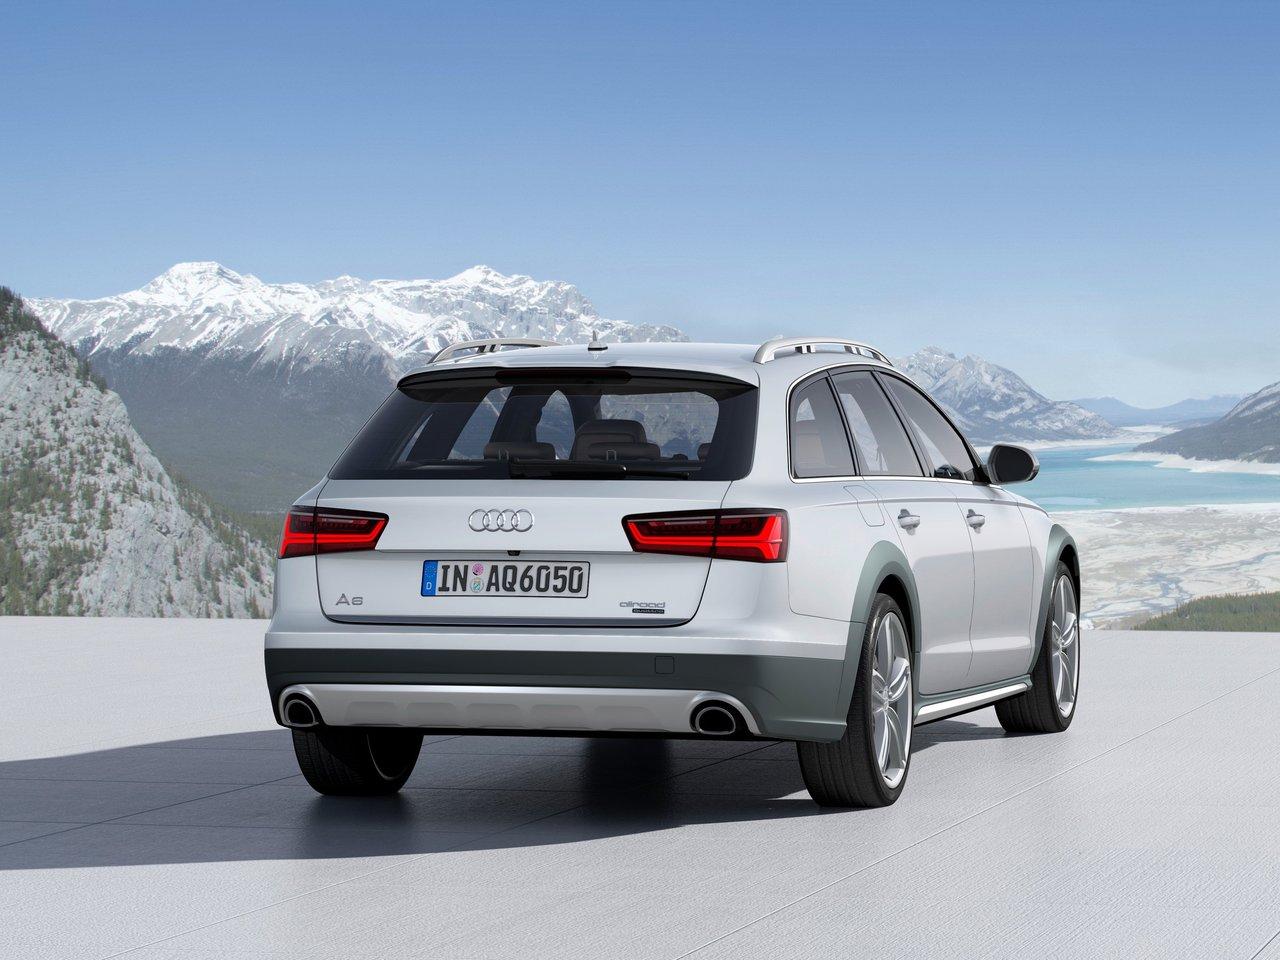 Audi A6 Allroad Quattro 4g C7 3 0 Tdi V6 245 Hp Quattro S Tronic